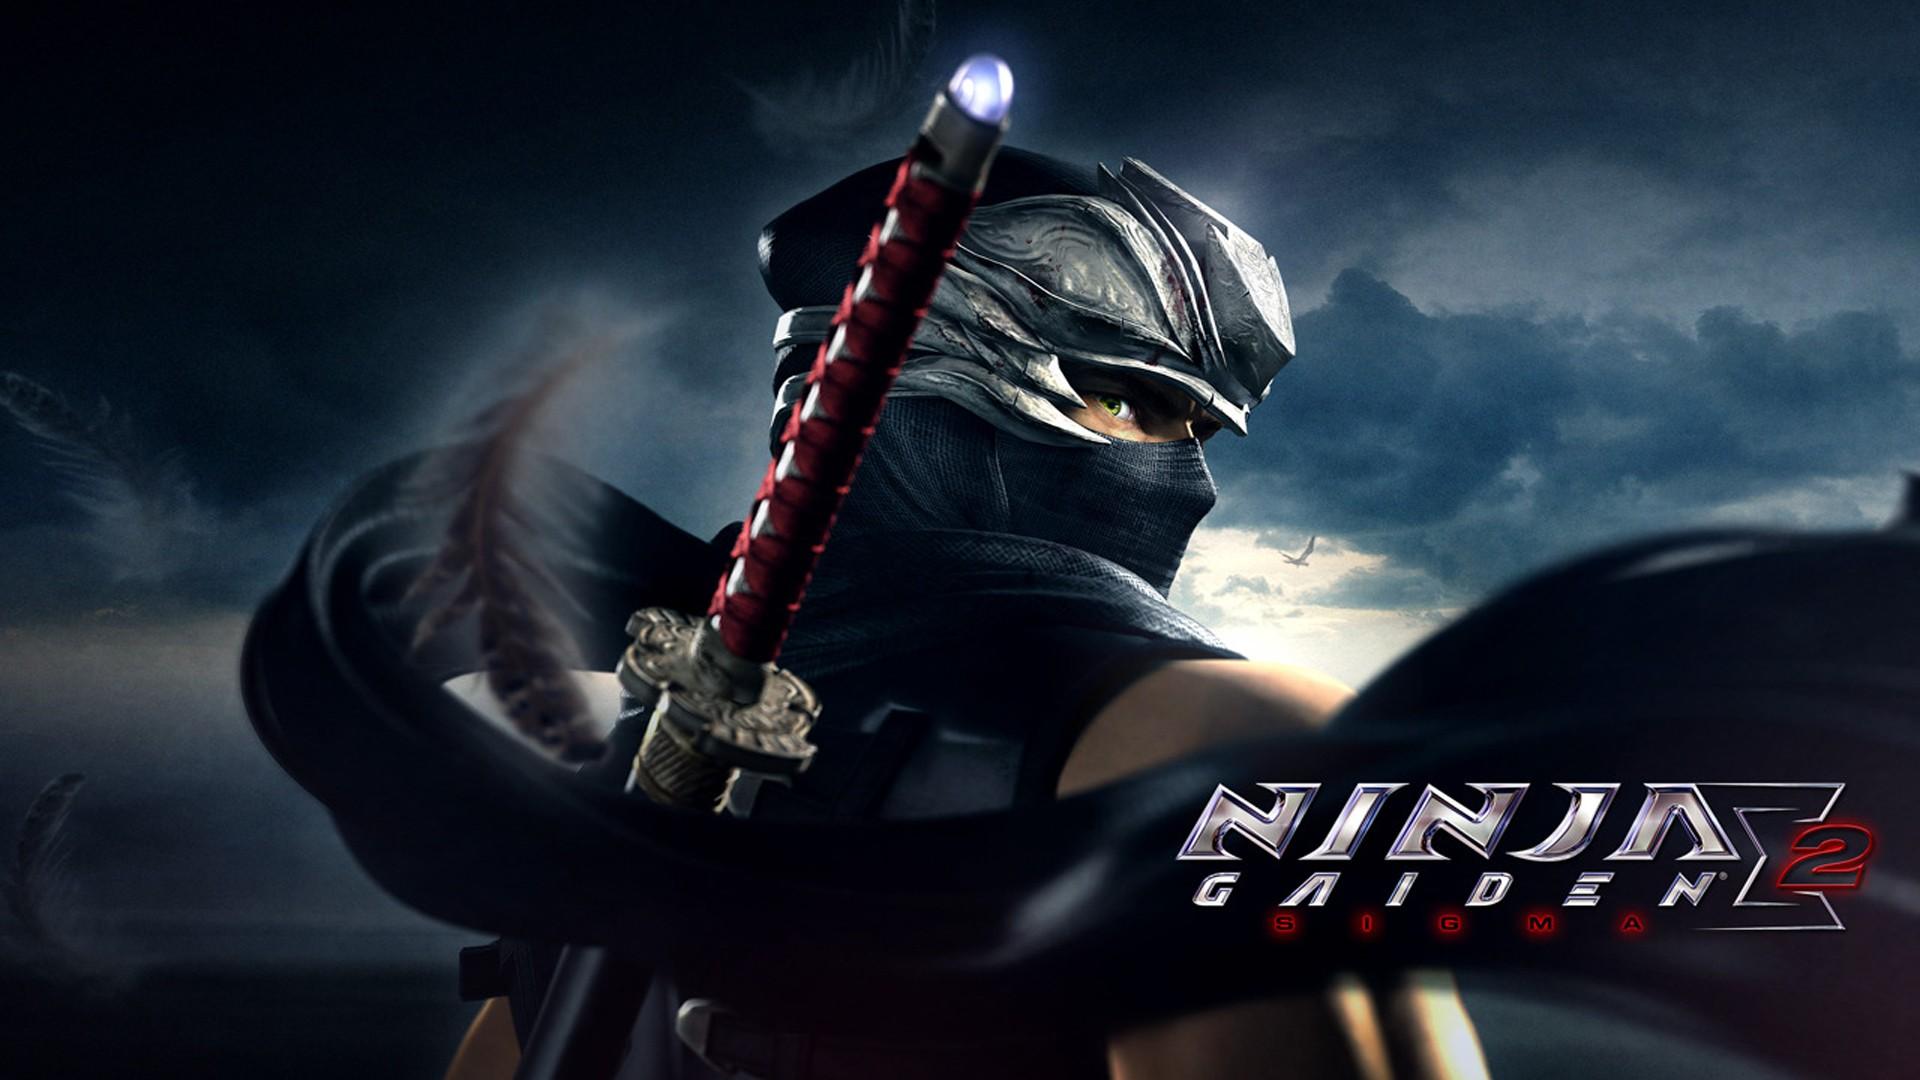 Female Ninja Wallpaper Images Wallpapers of Female Ninja in Full